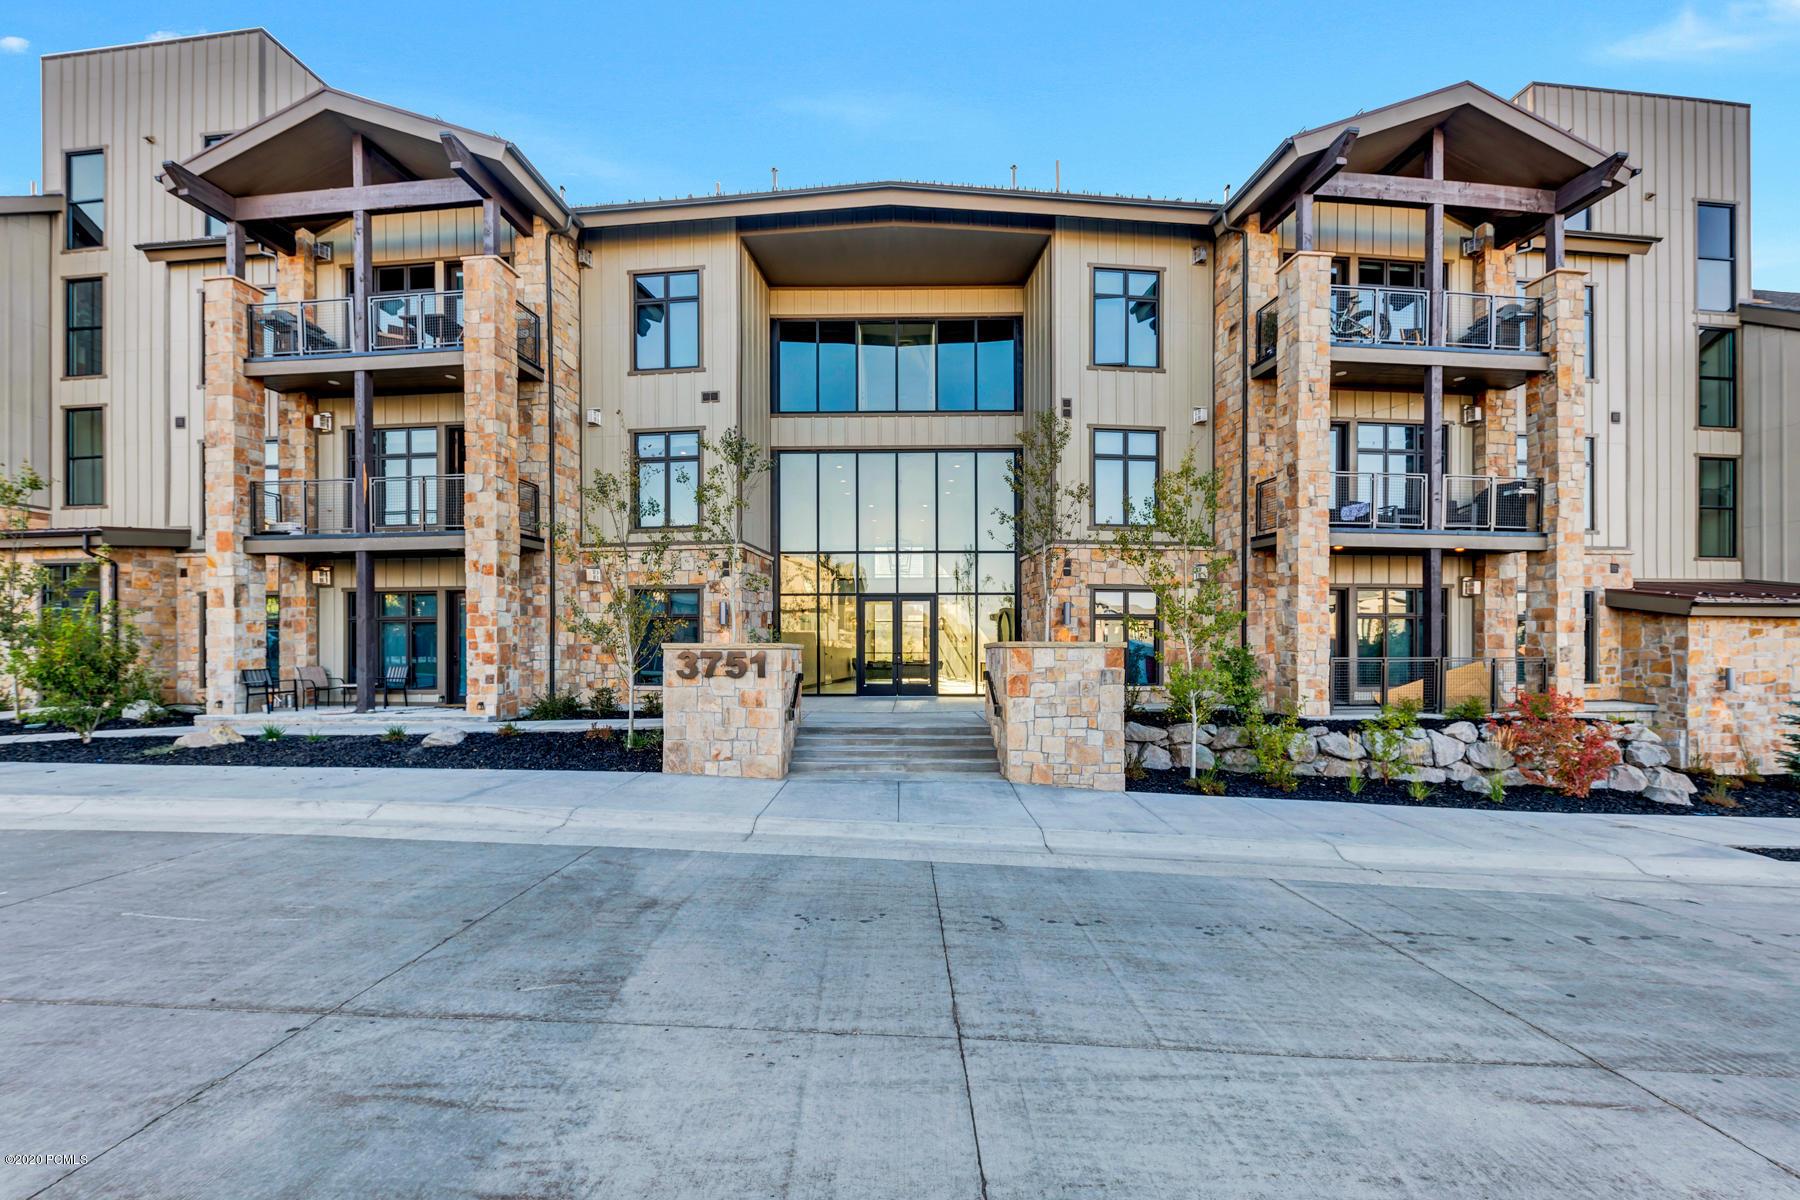 3751 Blackstone Drive, Park City, Utah 84098, 2 Bedrooms Bedrooms, ,3 BathroomsBathrooms,Condominium,For Sale,Blackstone,12003543